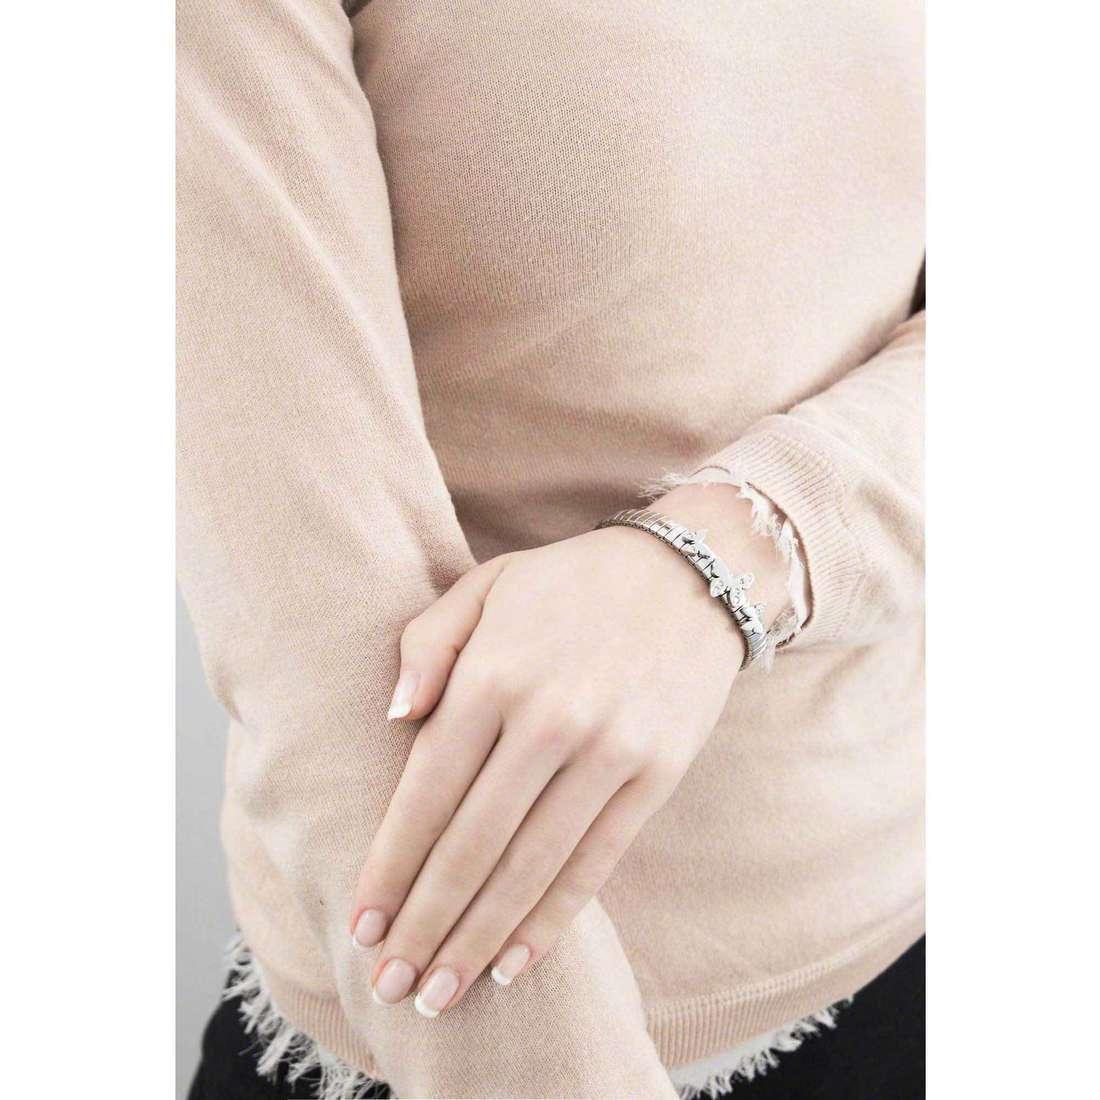 Nomination bracciali Butterfly donna 021300/001 indosso